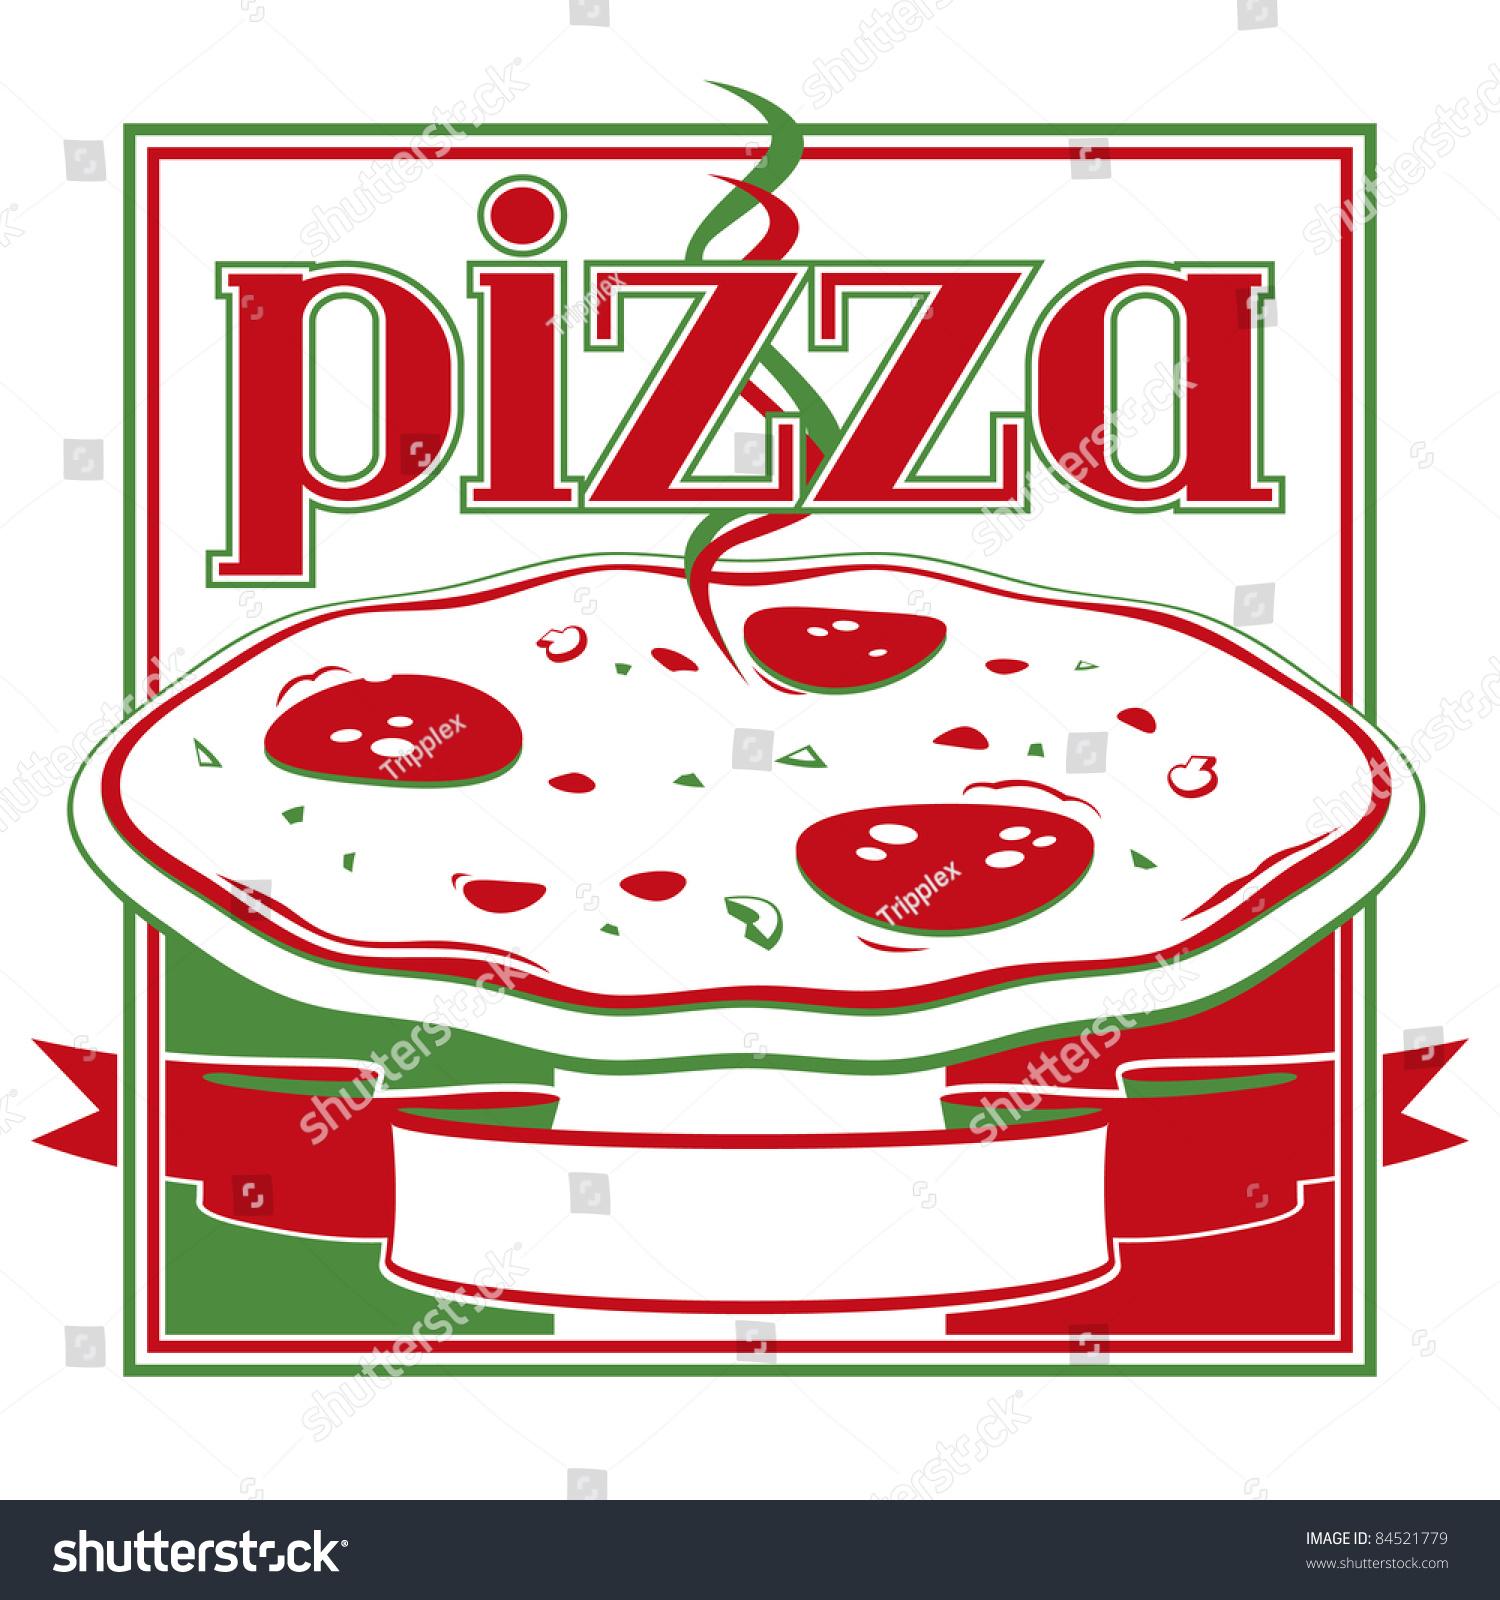 pizza box clipart free - photo #40